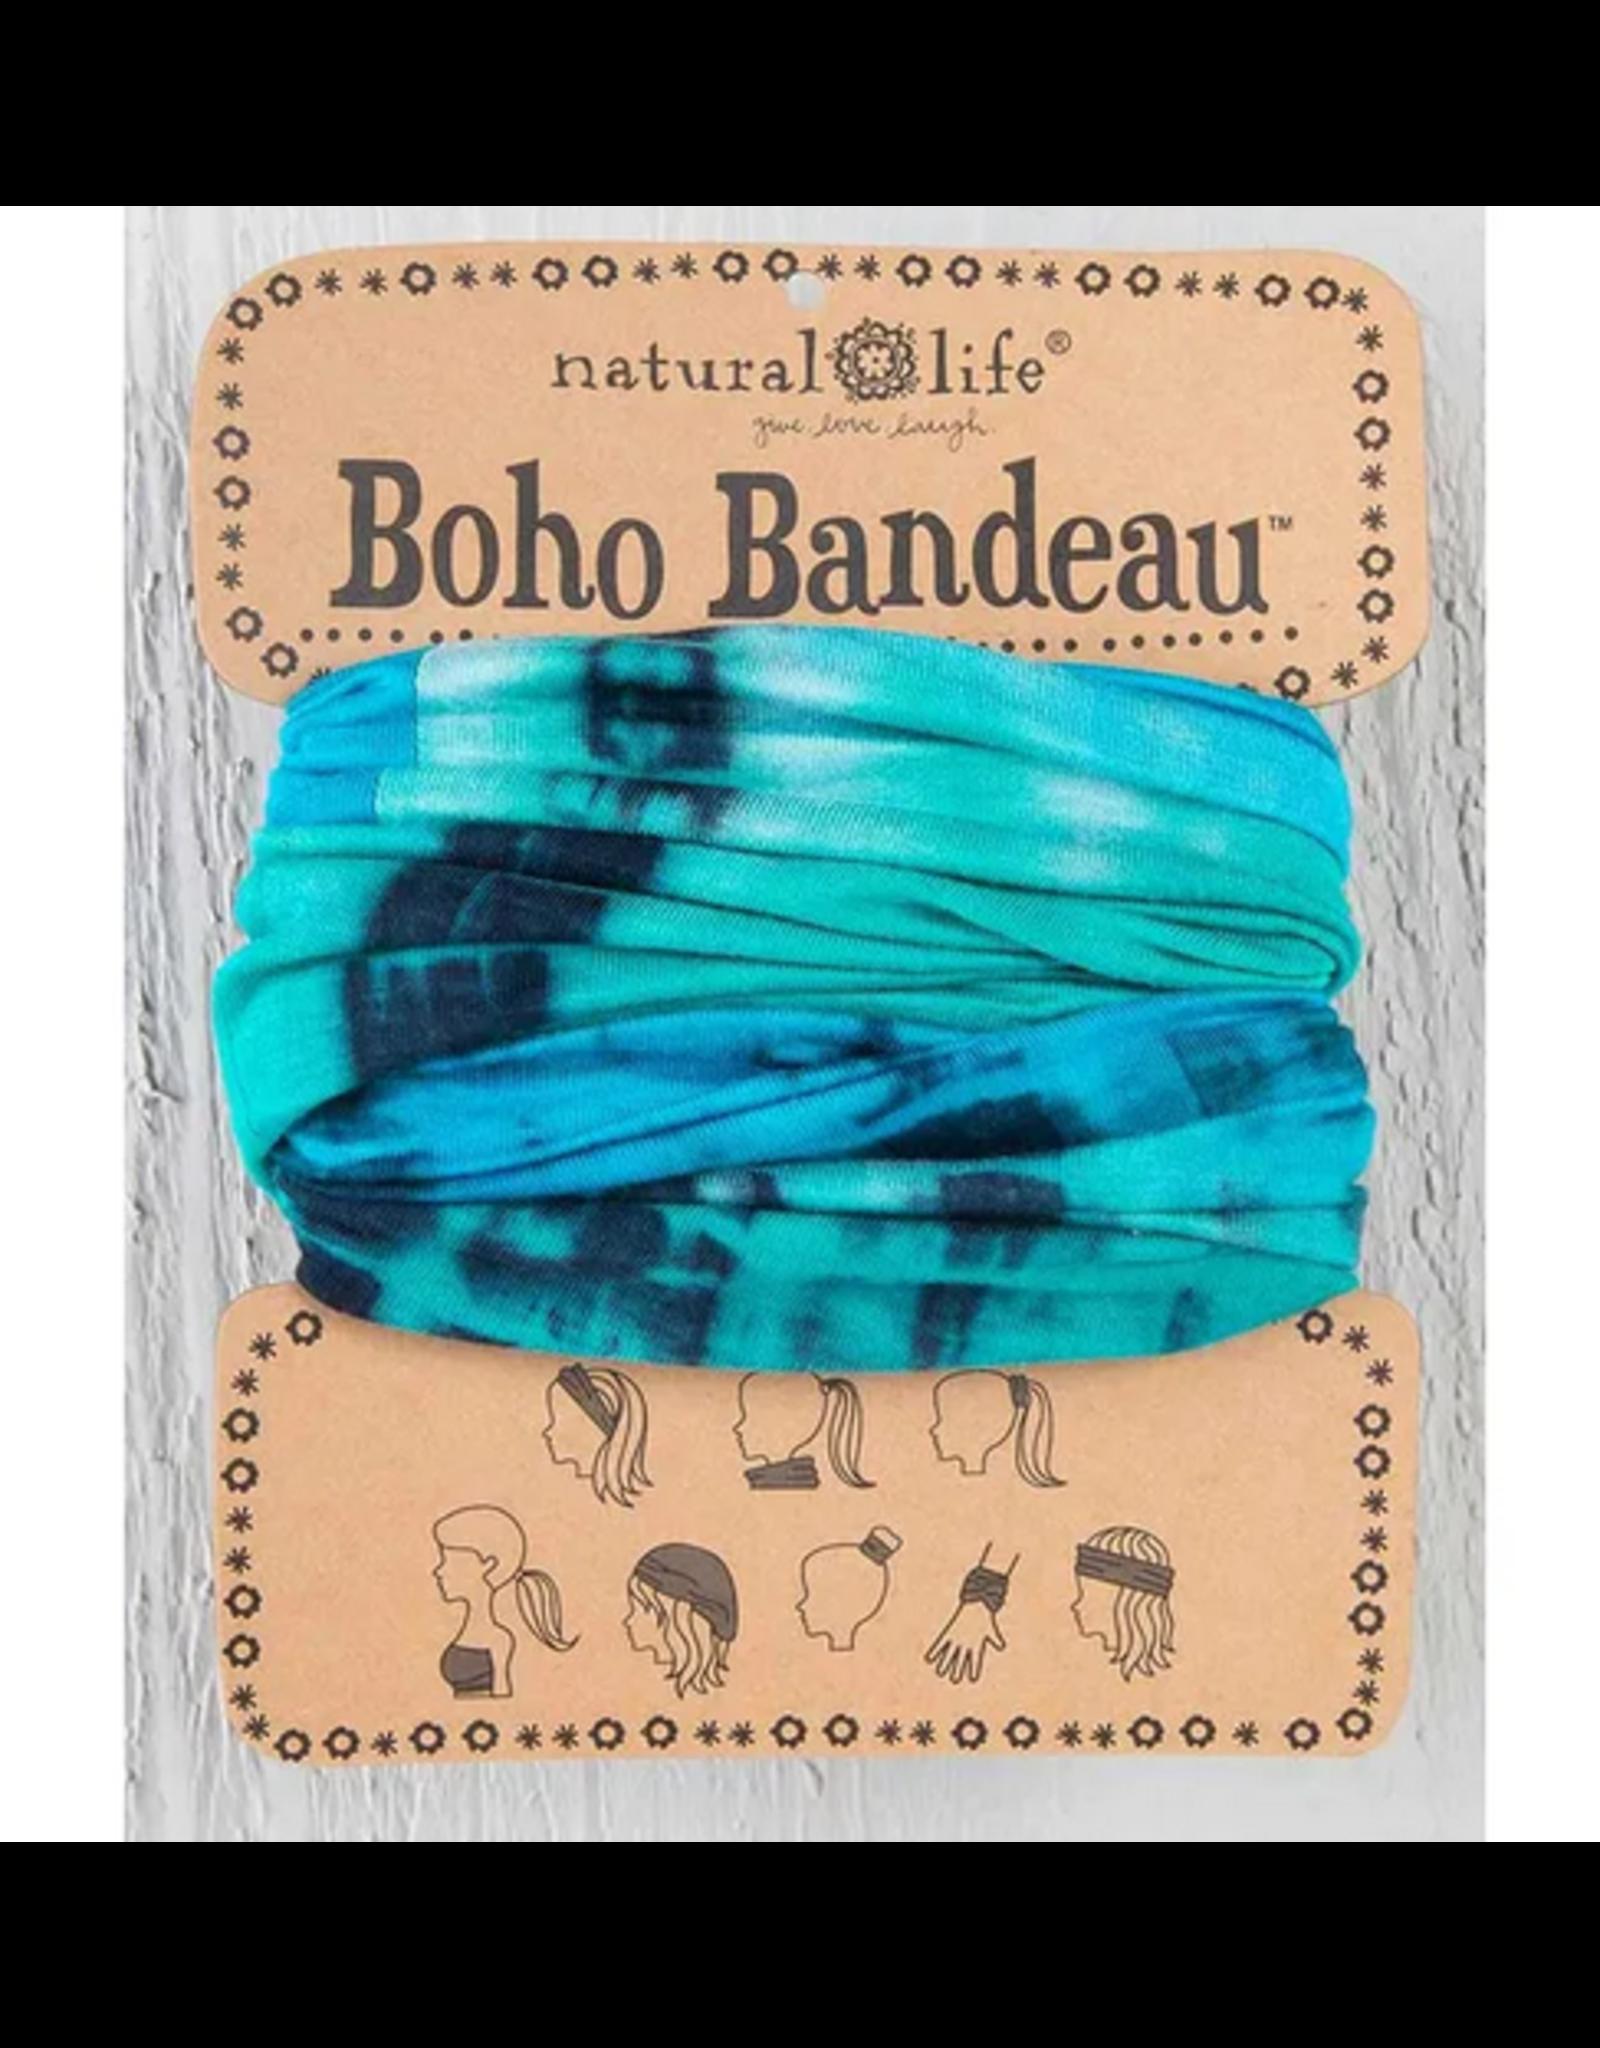 Natural LIfe Boho Bandeau, Tie Dye Turquoise/Blue/White